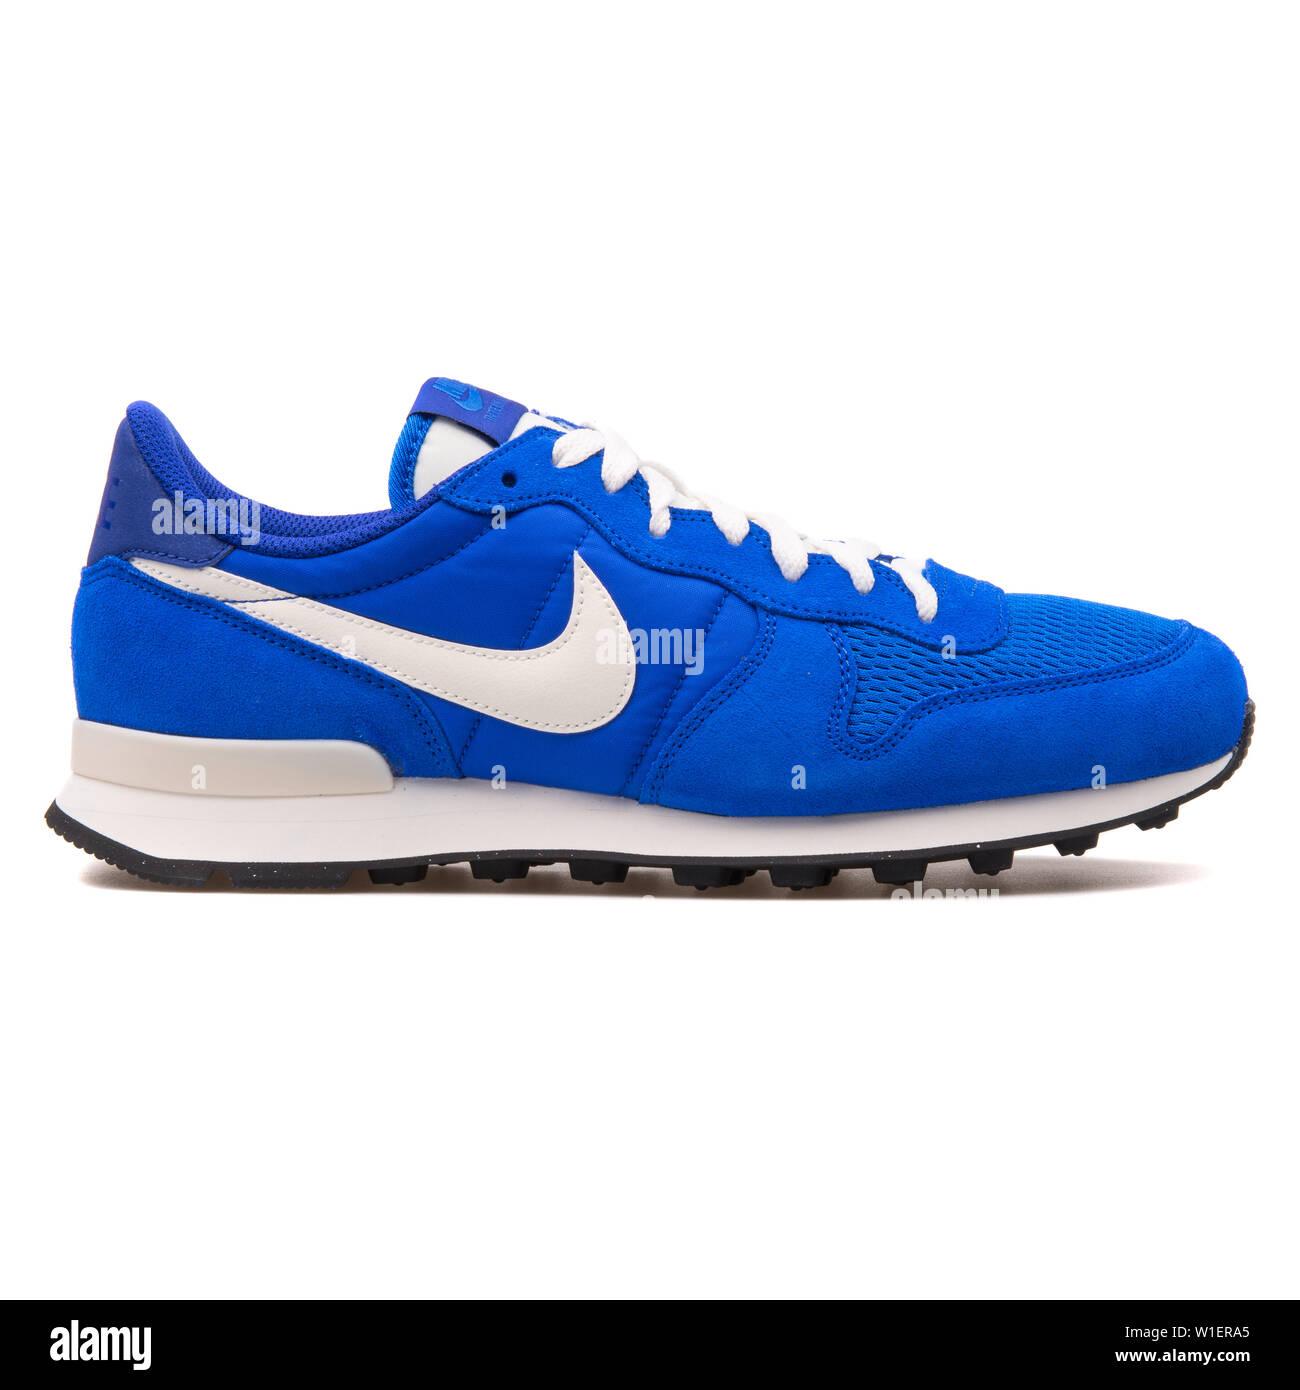 Monumental Curiosidad loseta  VIENNA, AUSTRIA - AUGUST 10, 2017: Nike Internationalist blue and white  sneaker on white background Stock Photo - Alamy